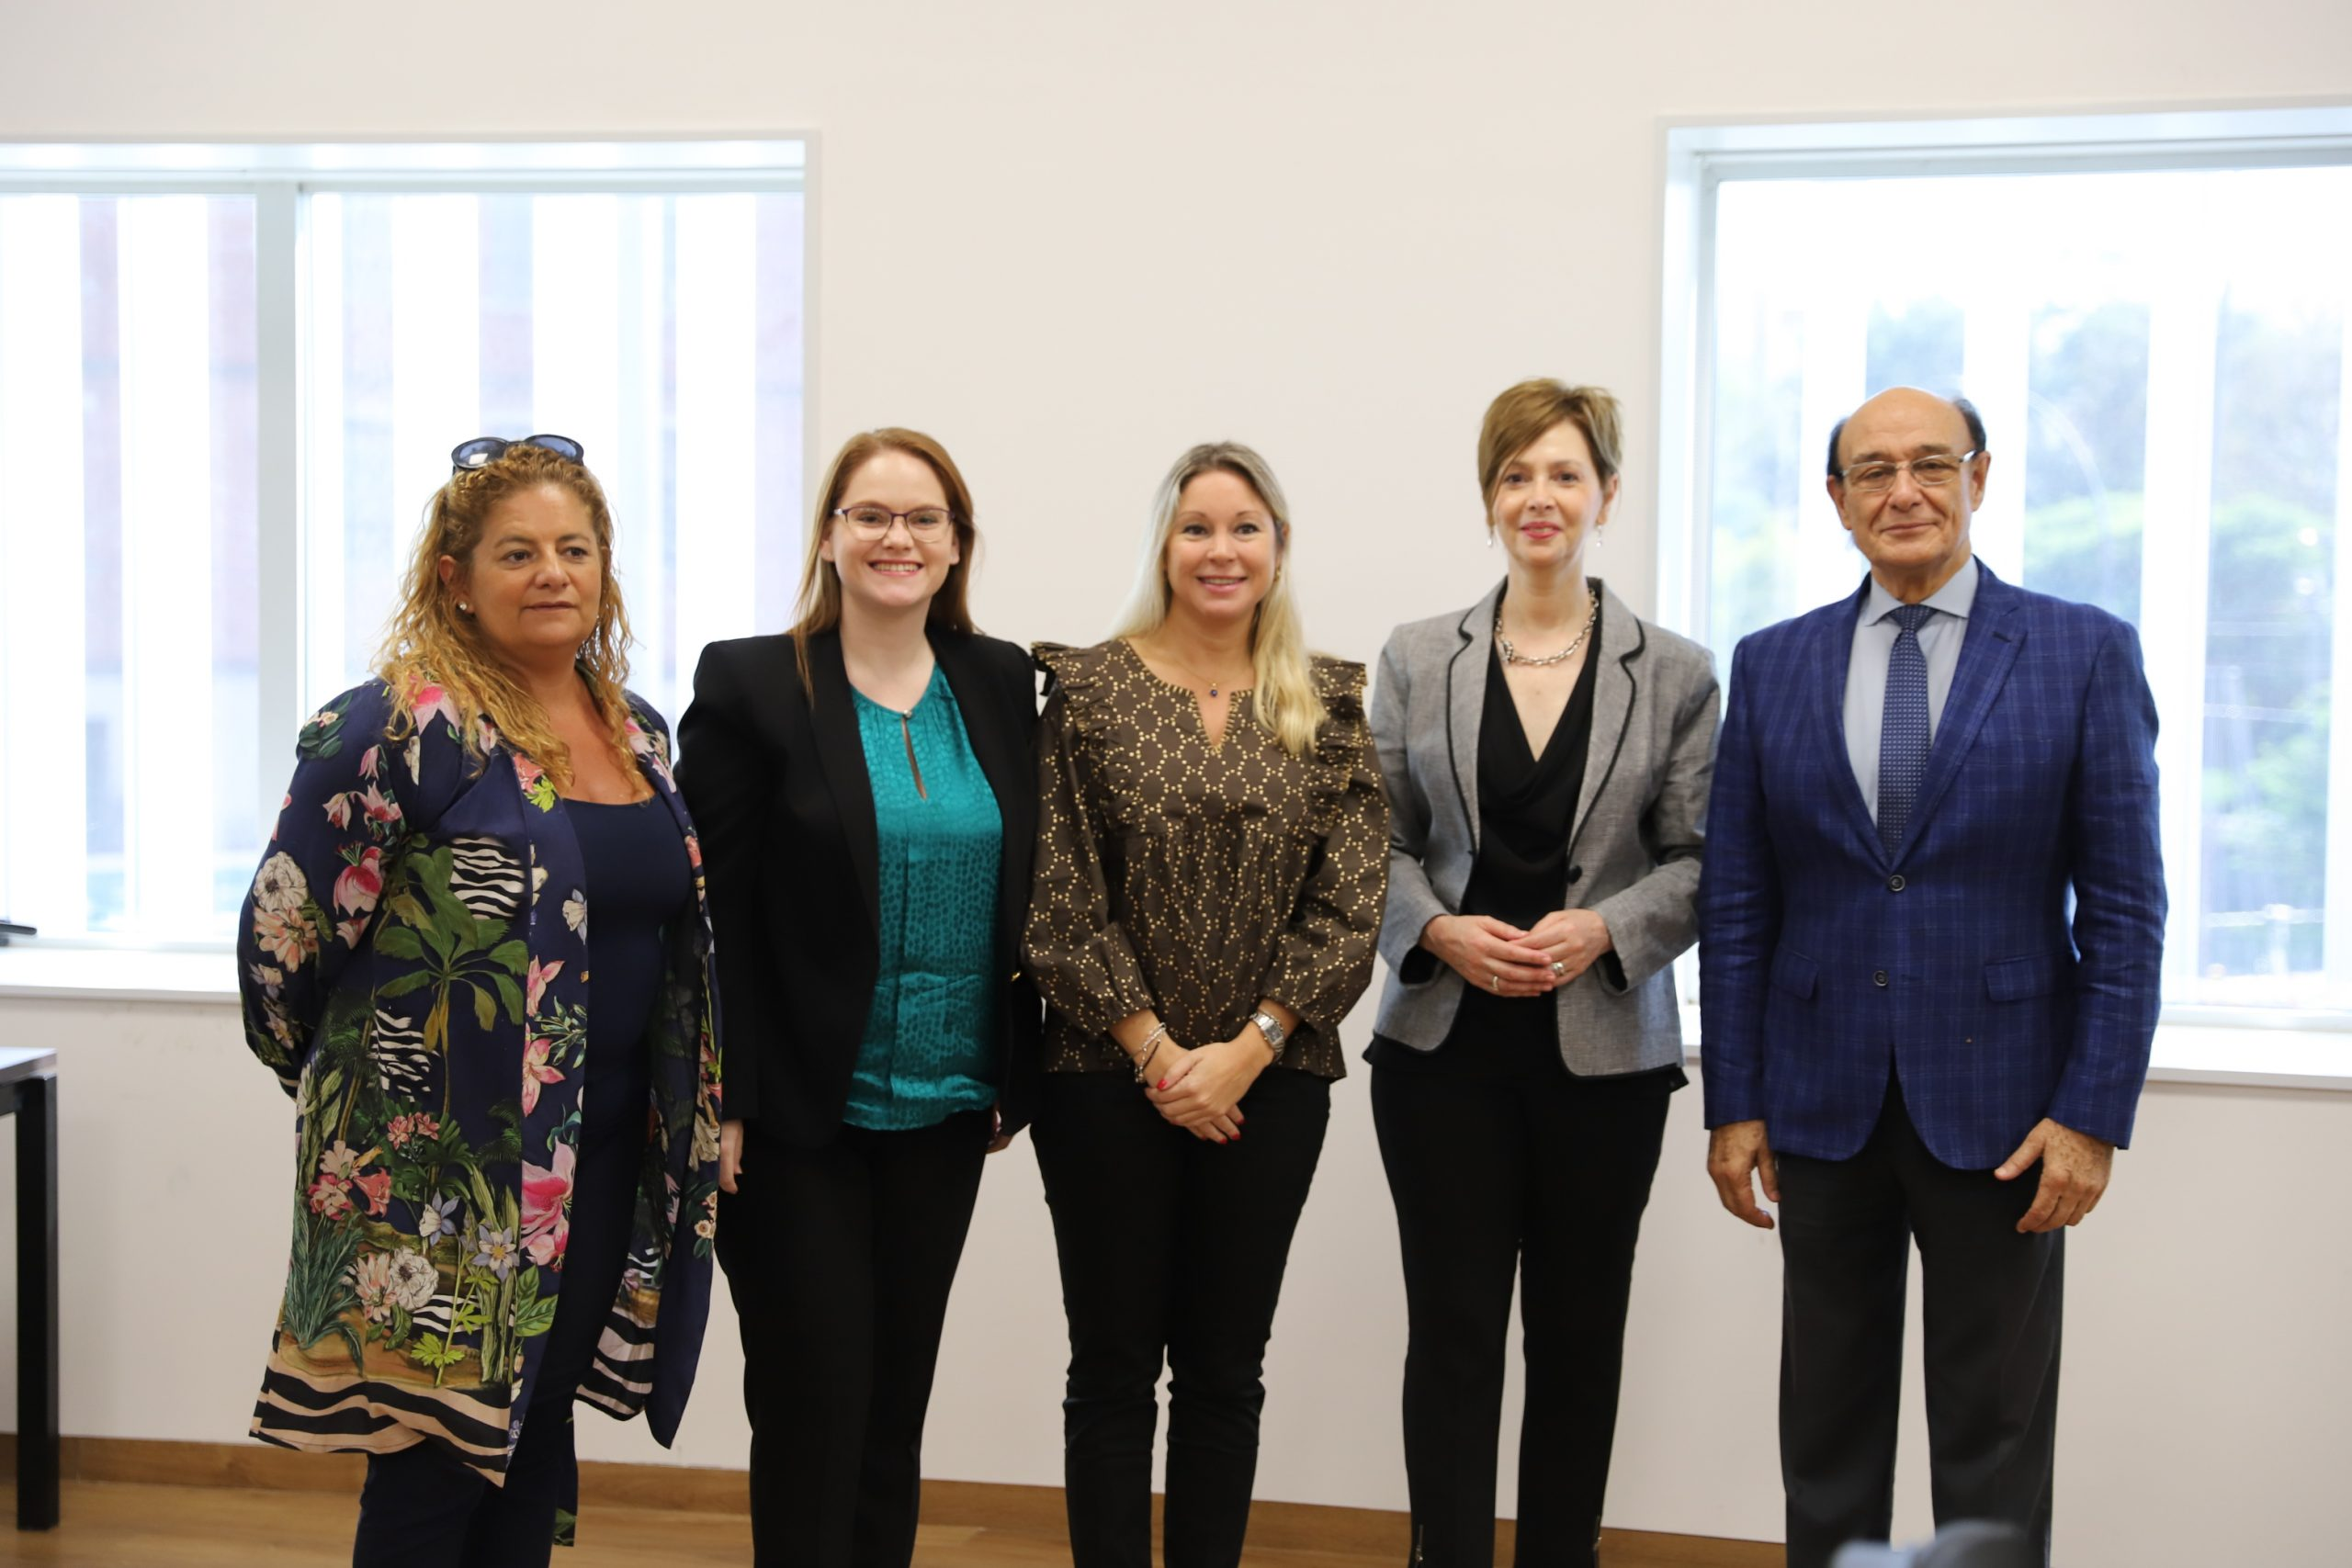 Jury: integrado por 4 representantes legislativos y la vocal del TSJ, Aída Tarditti